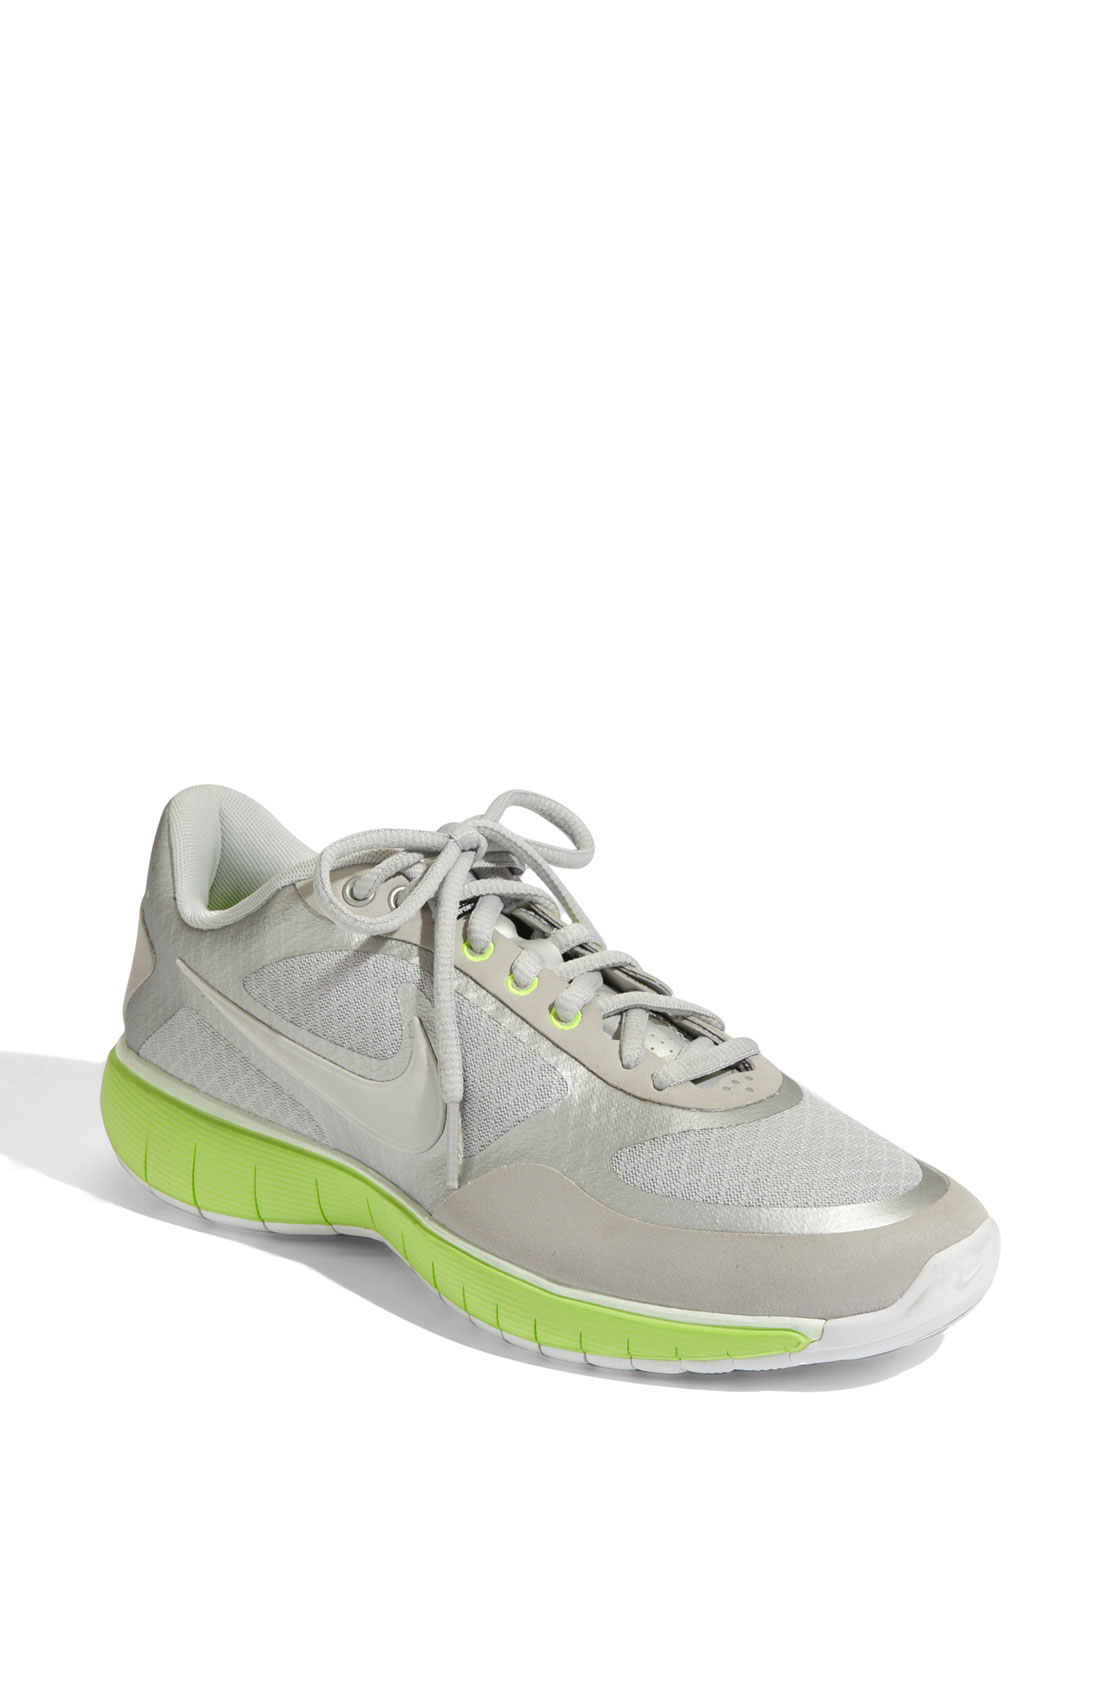 Nike Free Tr 5.0 V3 Review